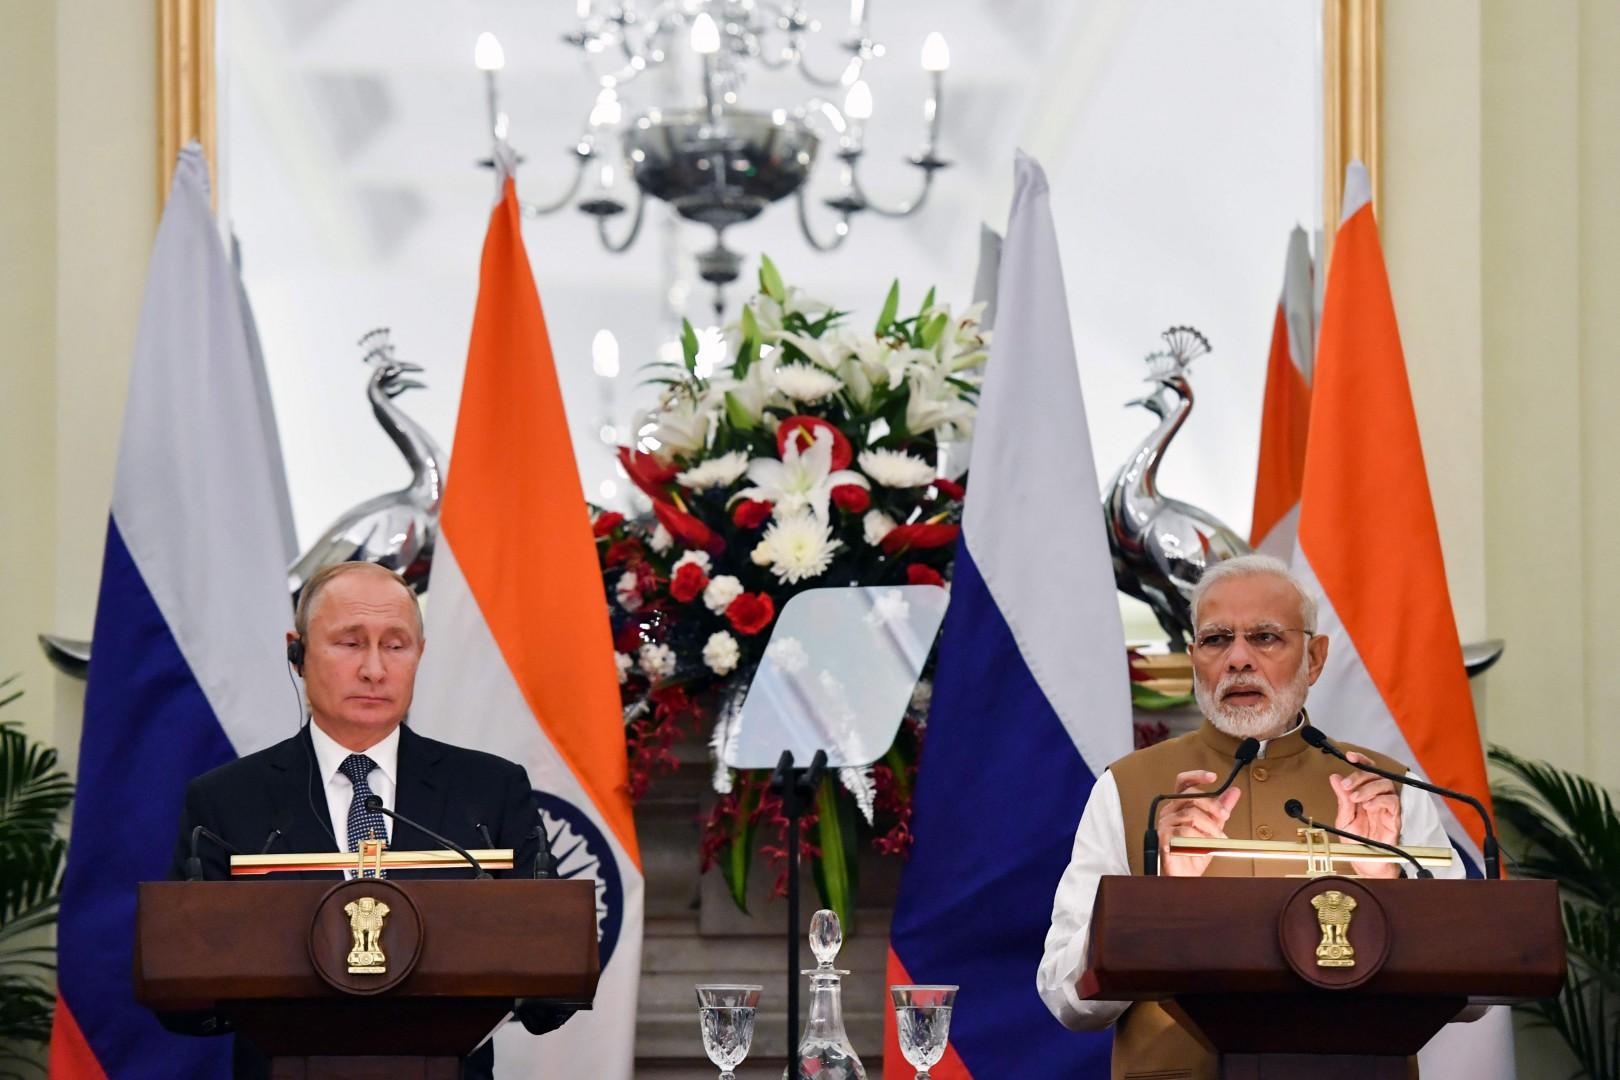 India, il premier Narendra Modi riceve Vladimir Putin a Nuova Deli (LaPresse)